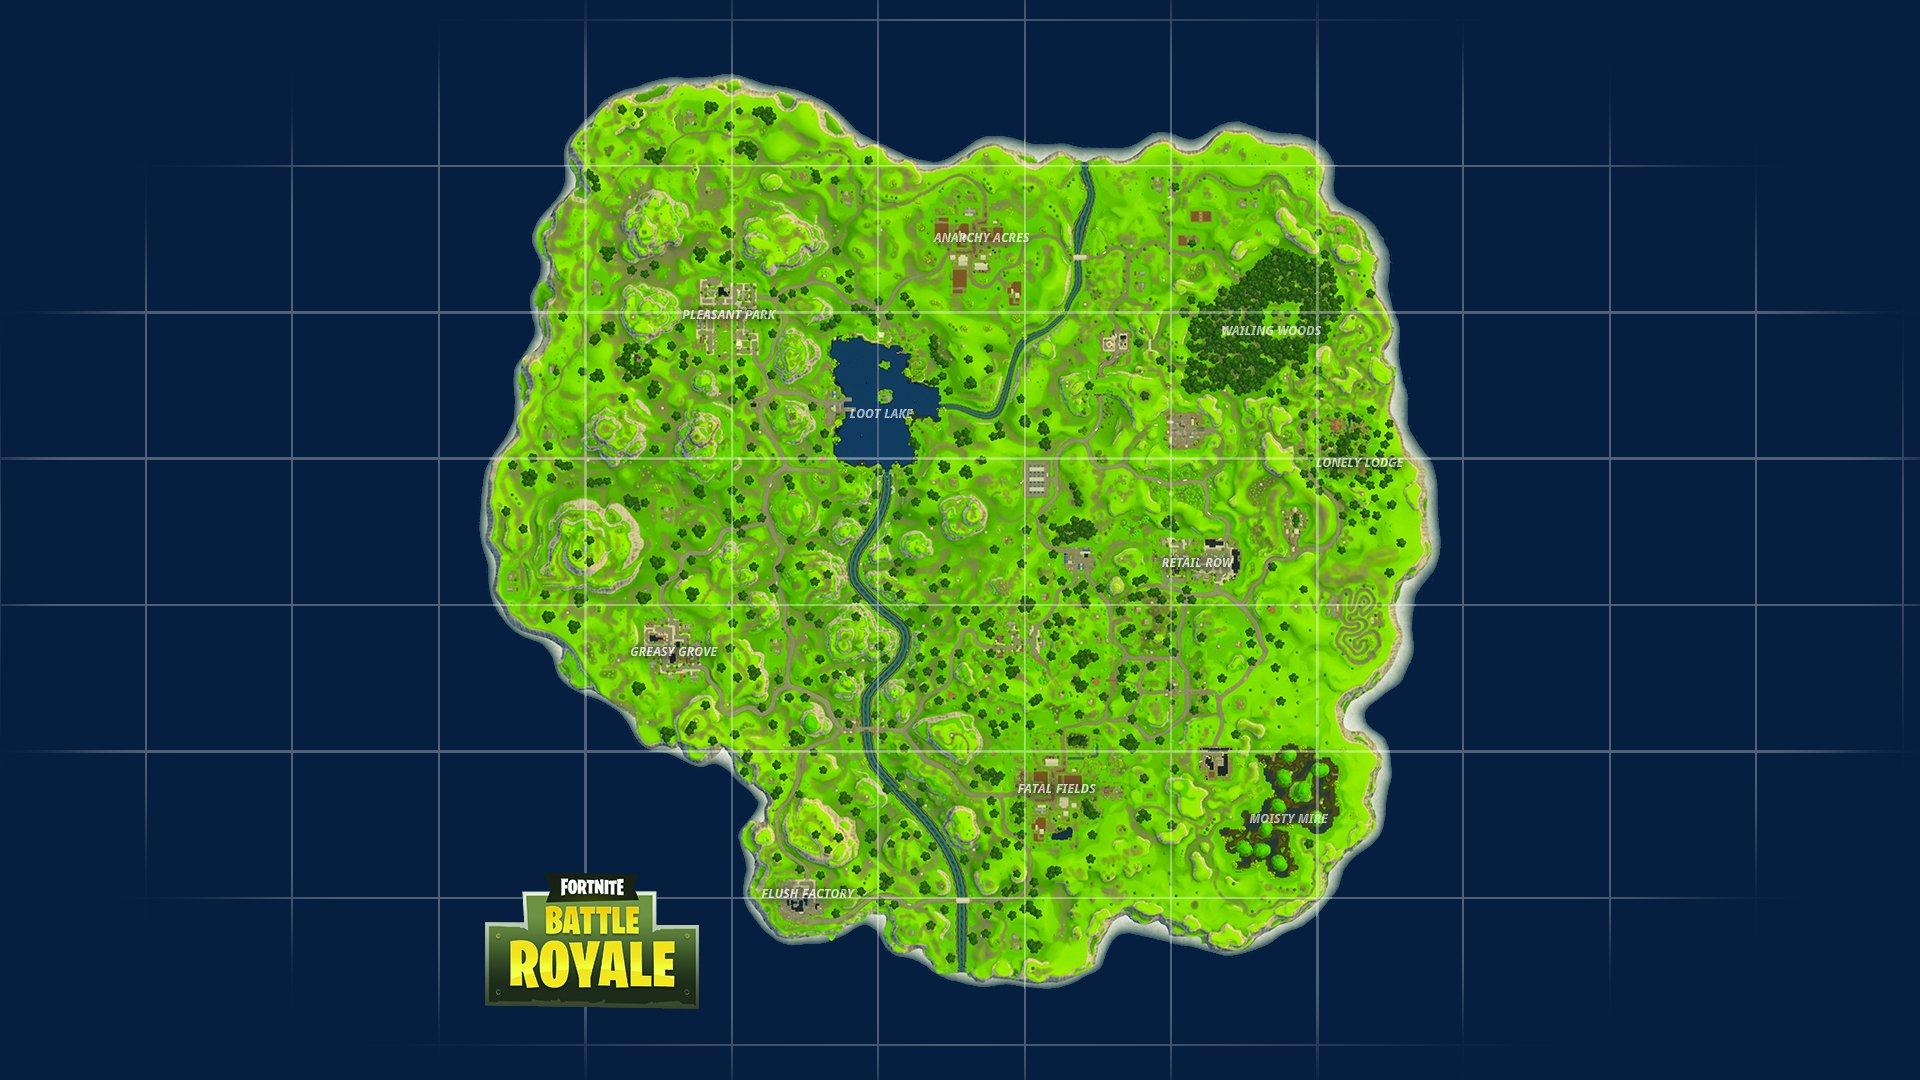 Fortnite New Map Battle Royale 1920x1080 Wallpaper Teahub Io